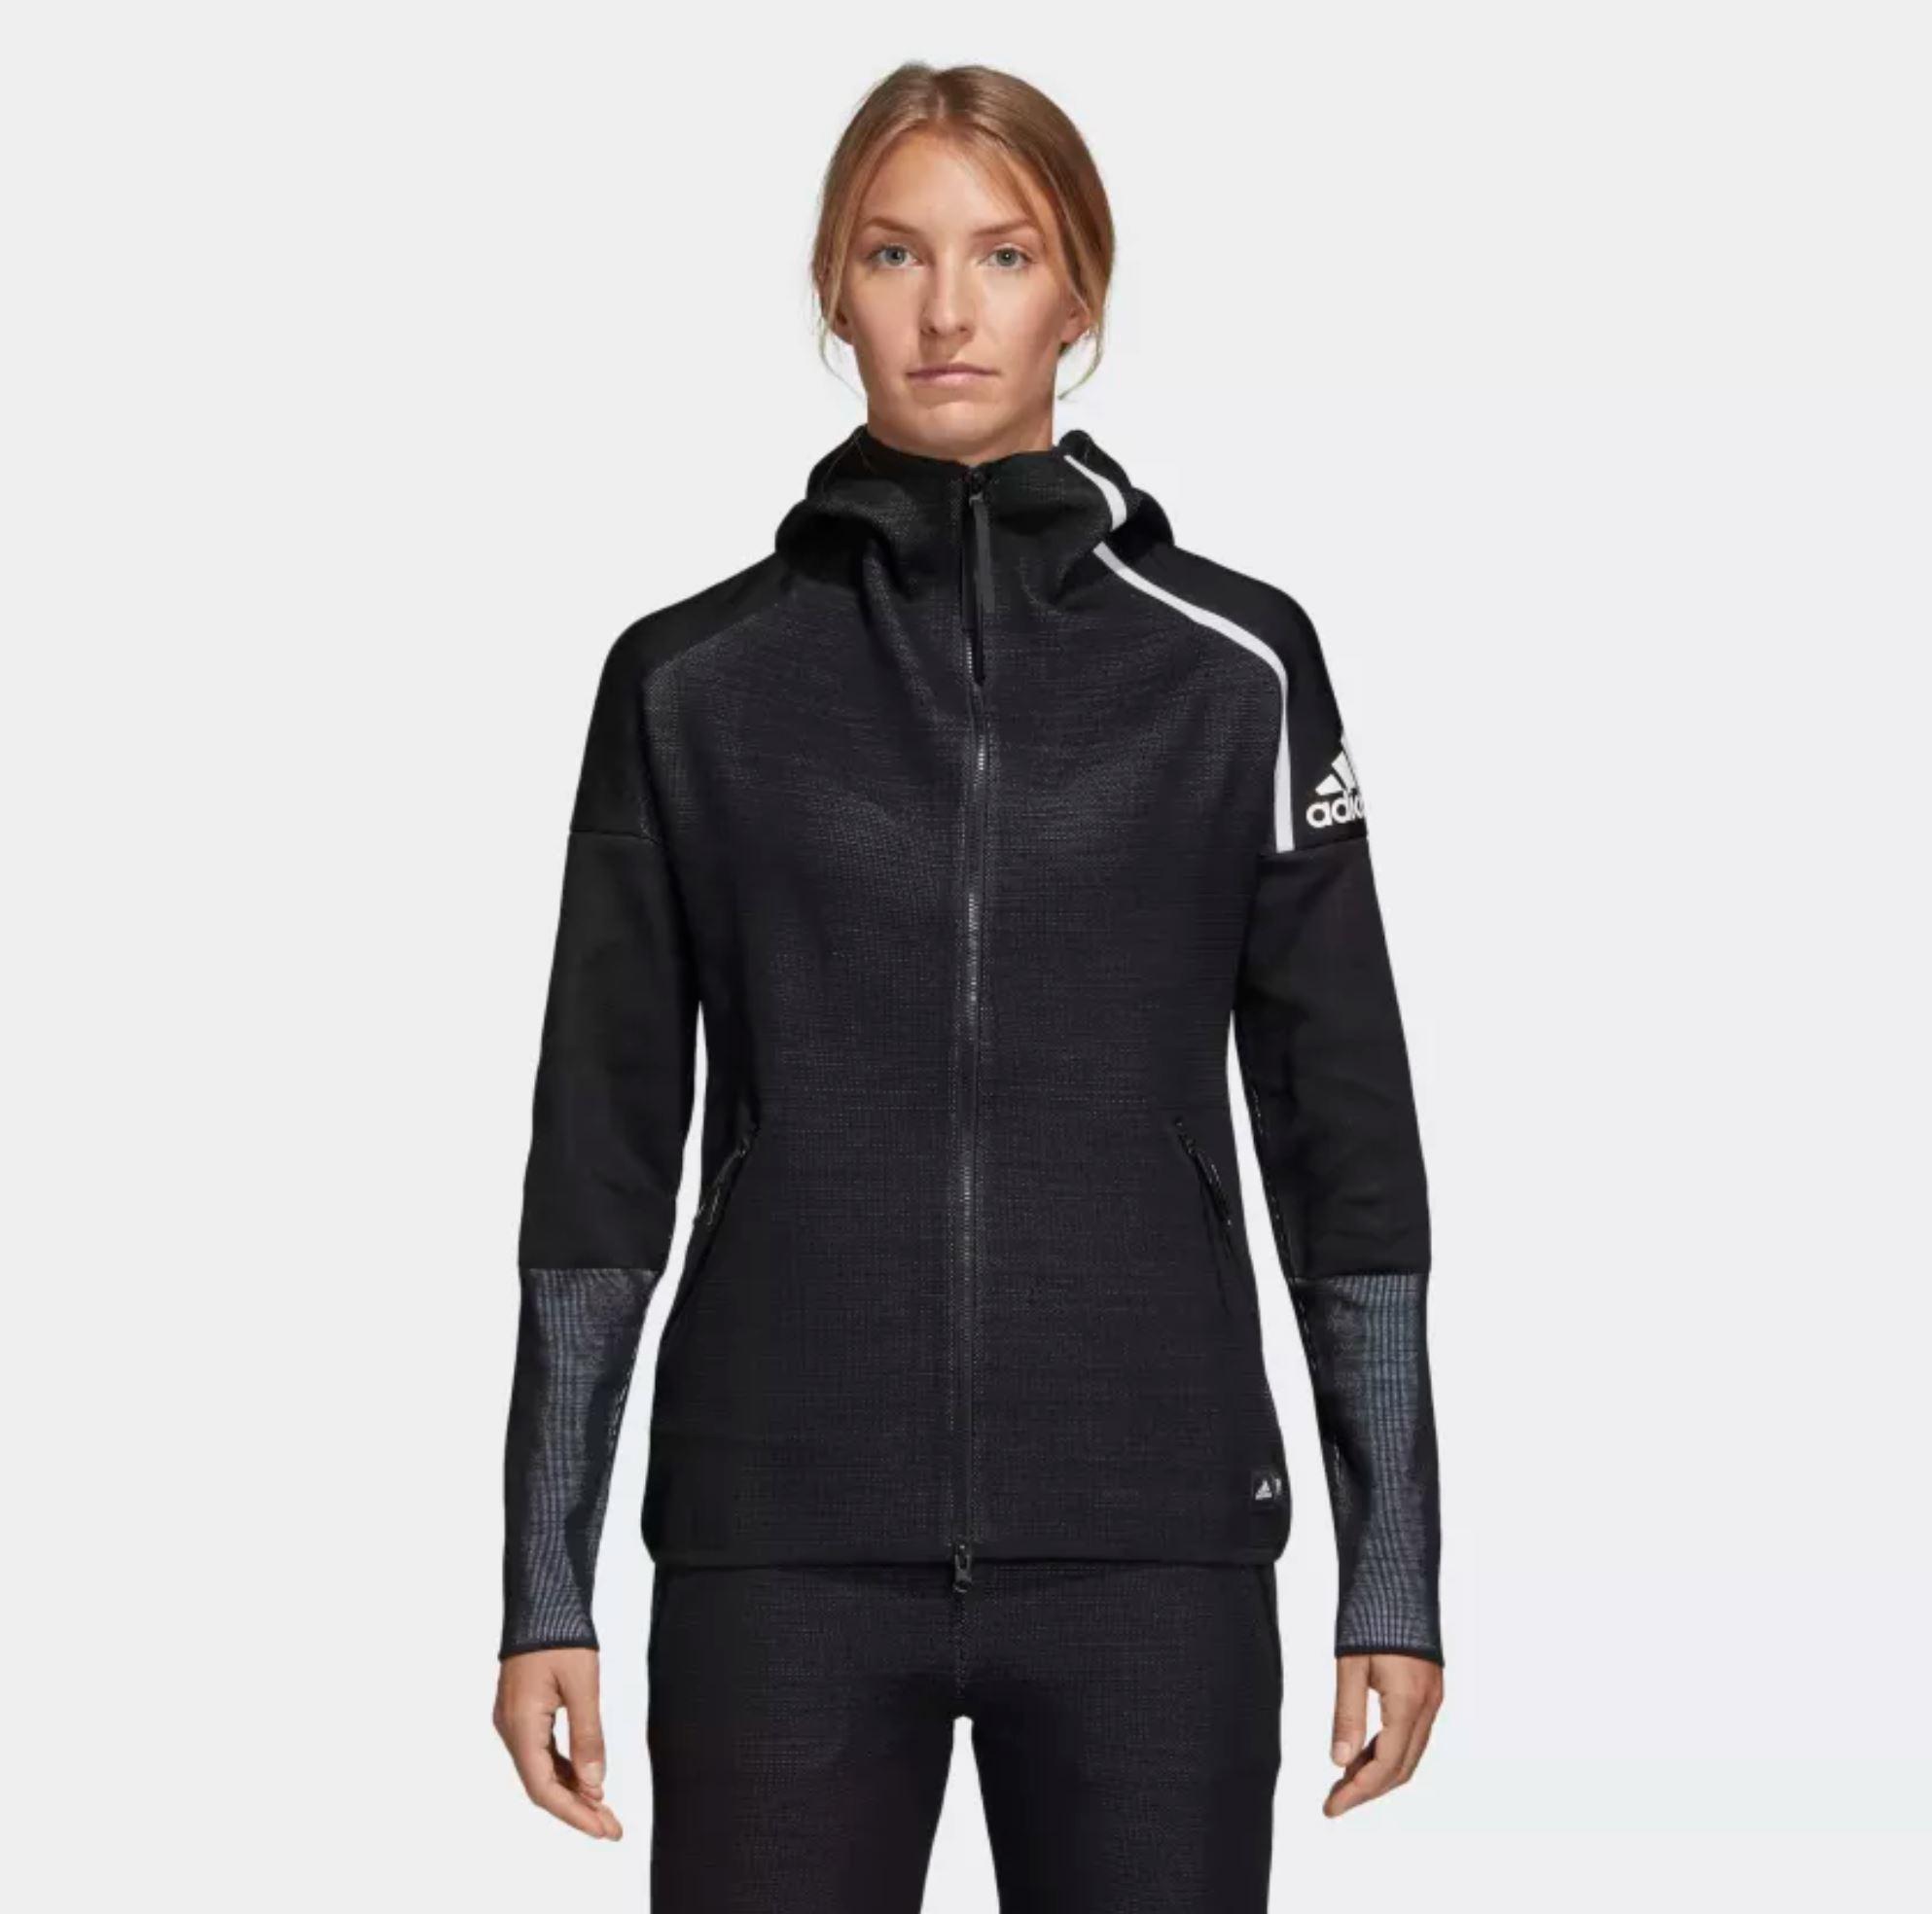 adidas ZNE hoodie parley womens